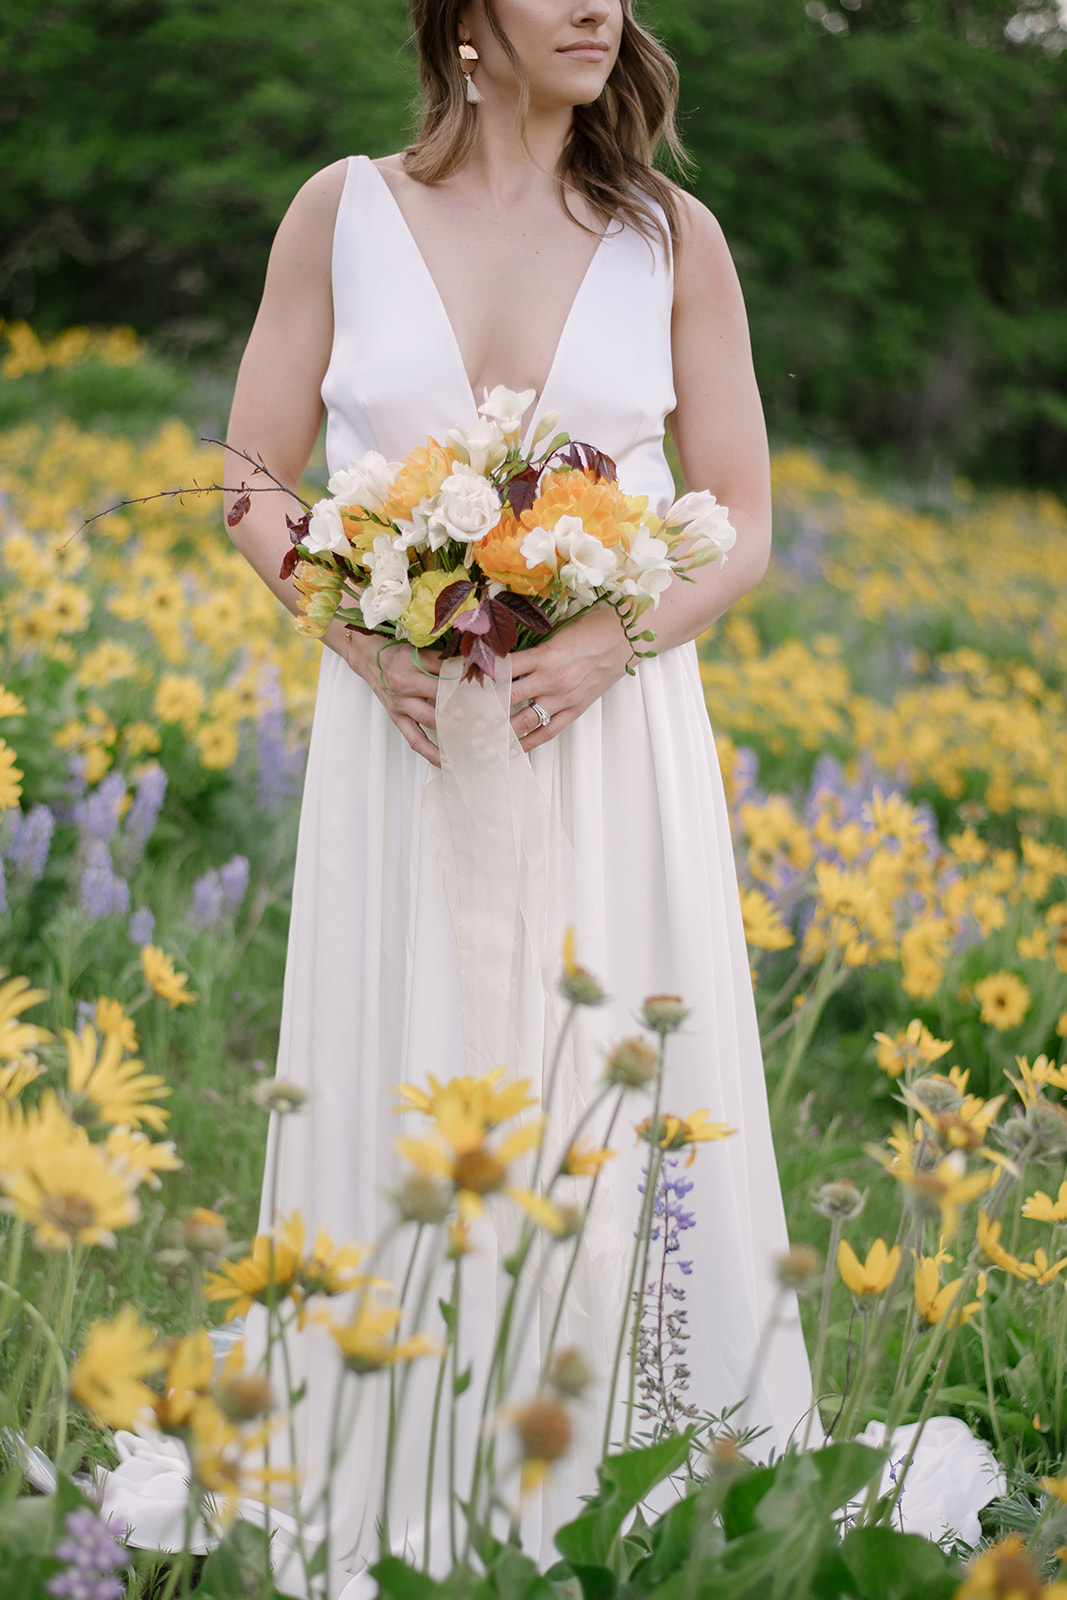 kamea_events_wedding_planner_portland_DeusAmor33.jpg